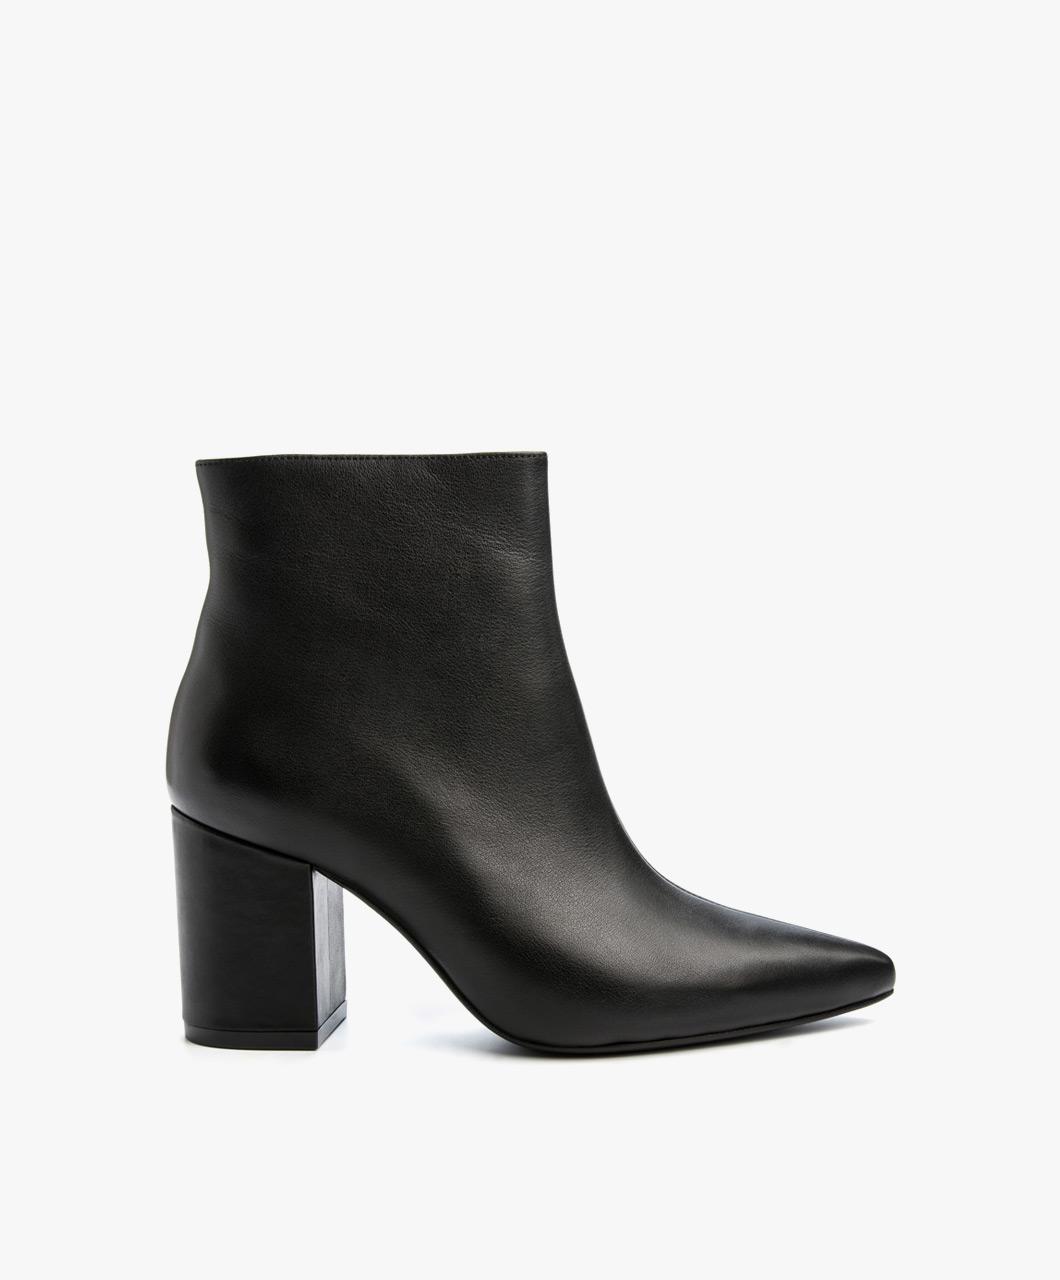 Immagine di ANINE BING Boot Natalie in Black Leather